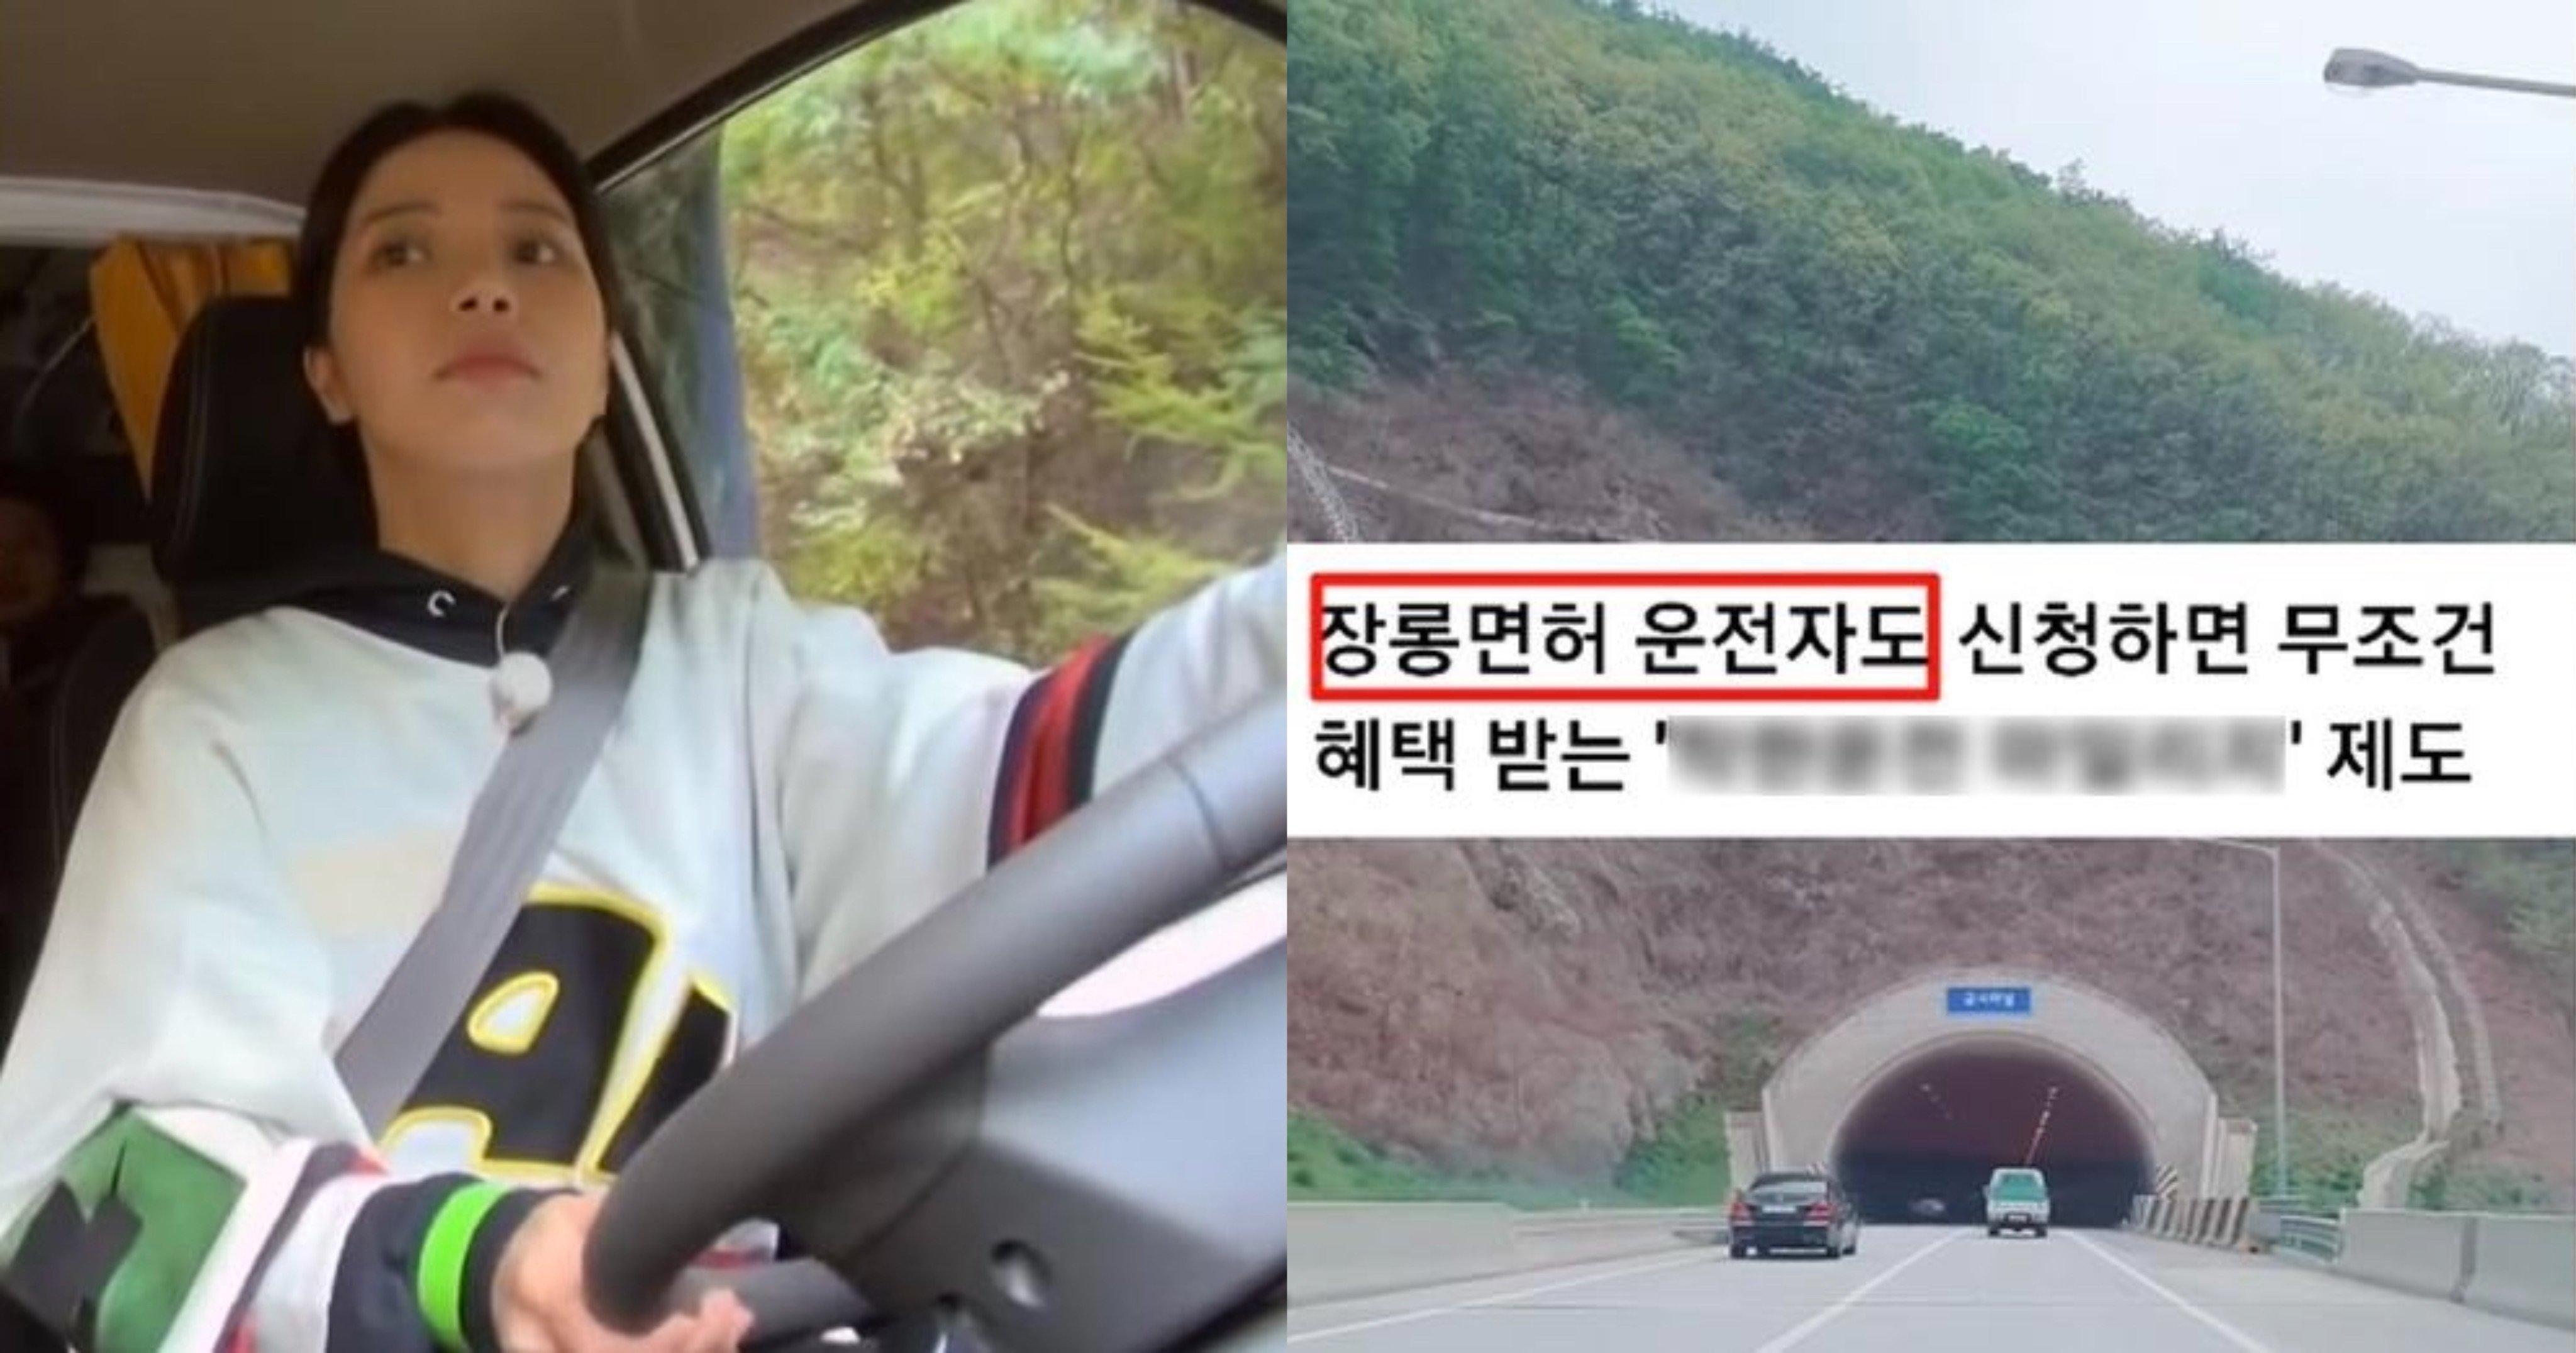 "76d08b32 acaf 4230 9a84 aec625a29067.jpeg?resize=1200,630 - ""빨리 신청하고 받으세요!""..한국인 대부분이 몰라서 손해 중인 '운전 마일리지'"